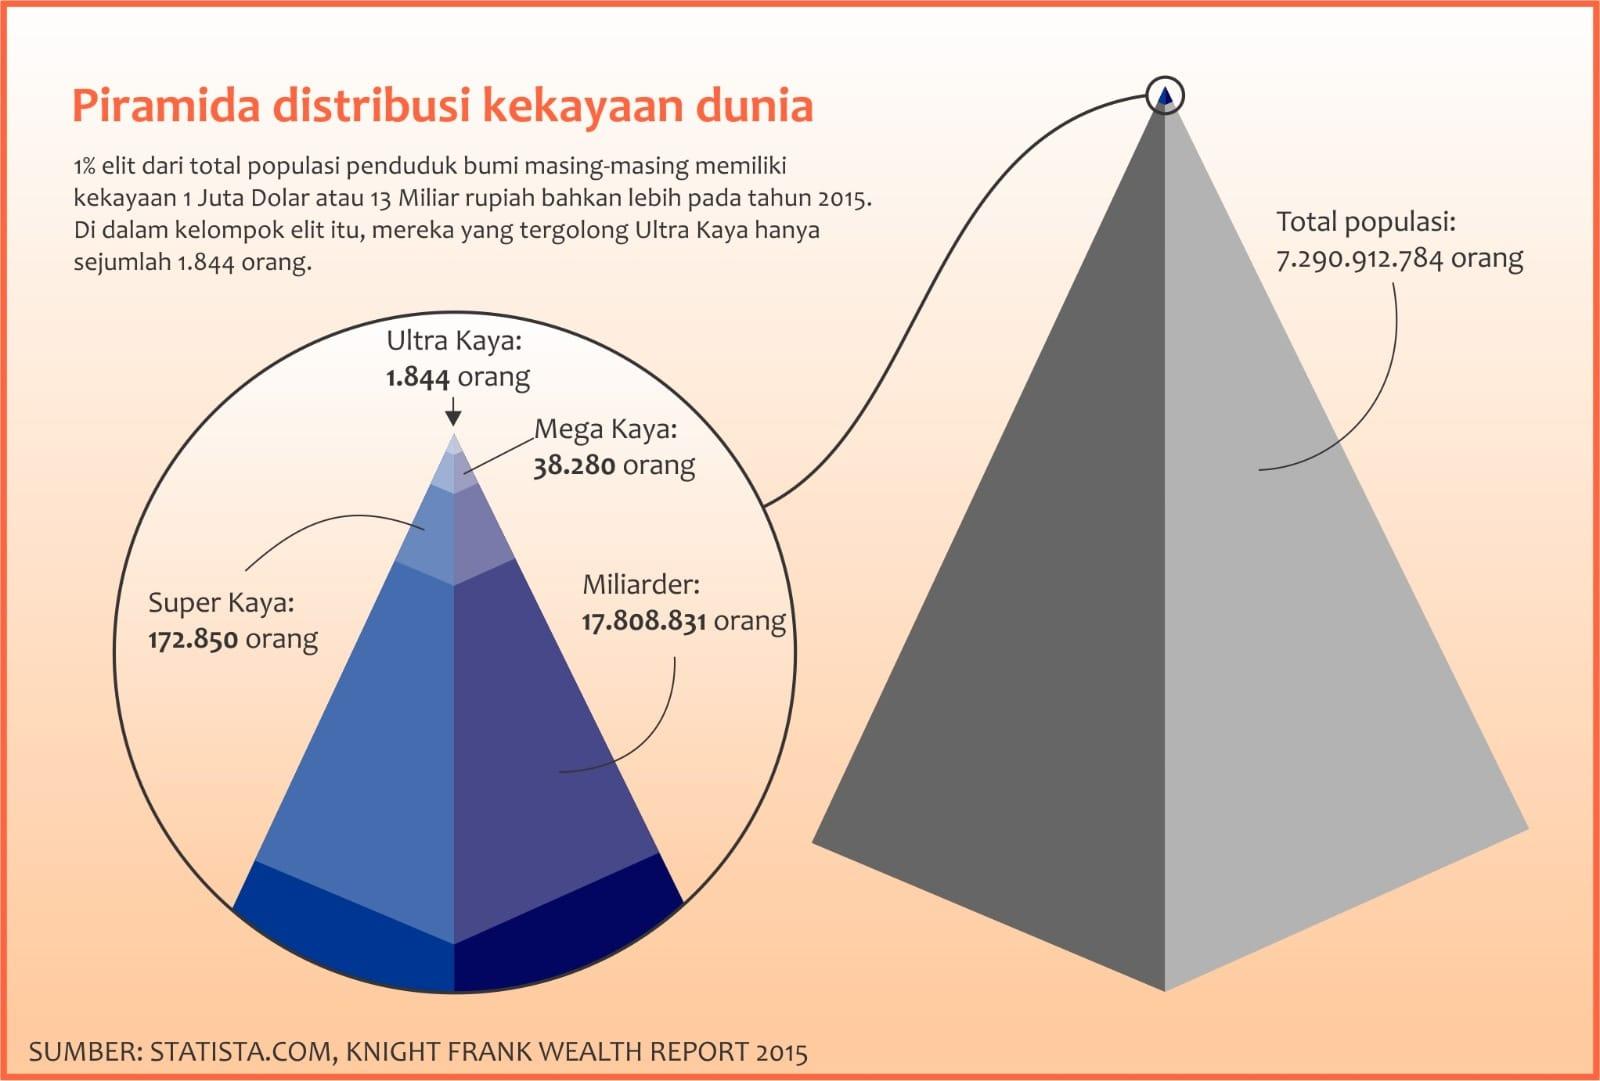 Piramida distribusi kekayaan dunia